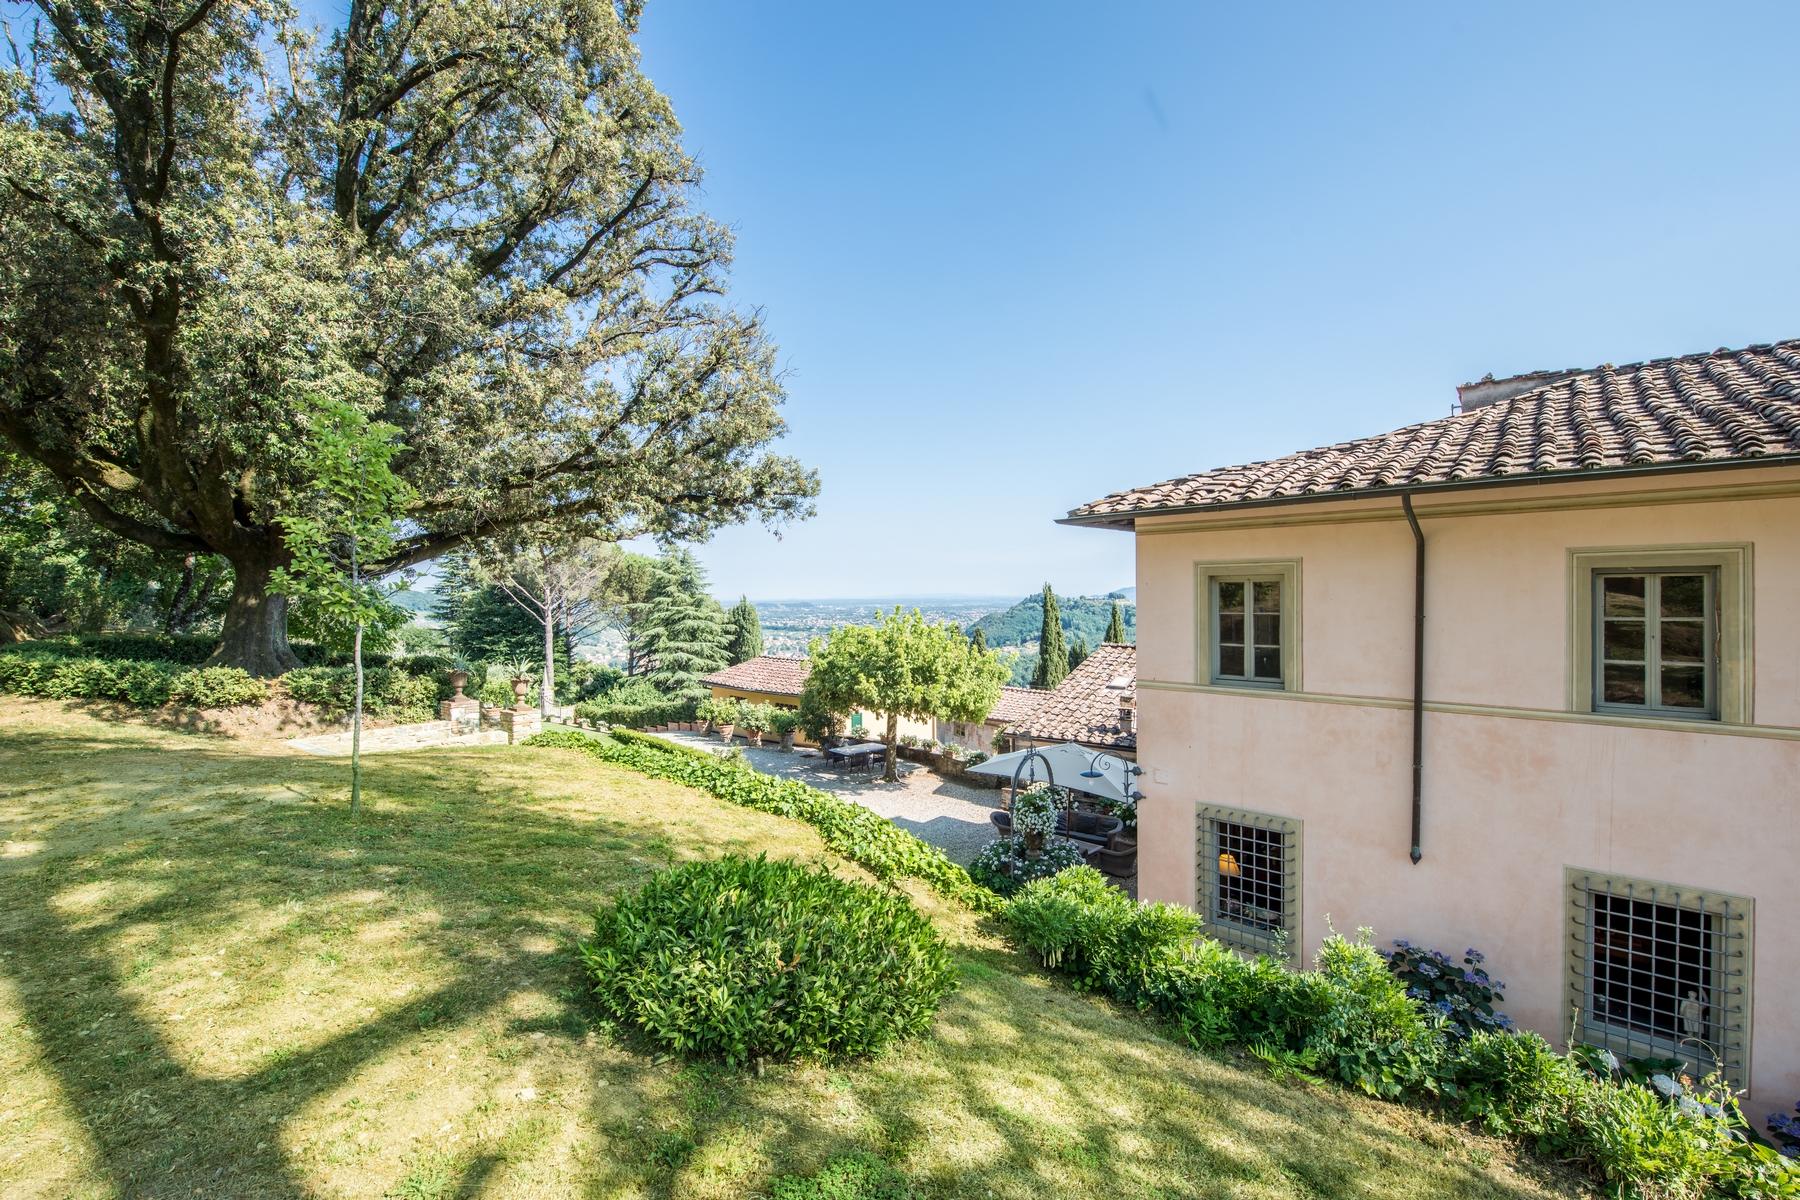 Villa in Vendita a Lucca: 5 locali, 2500 mq - Foto 15